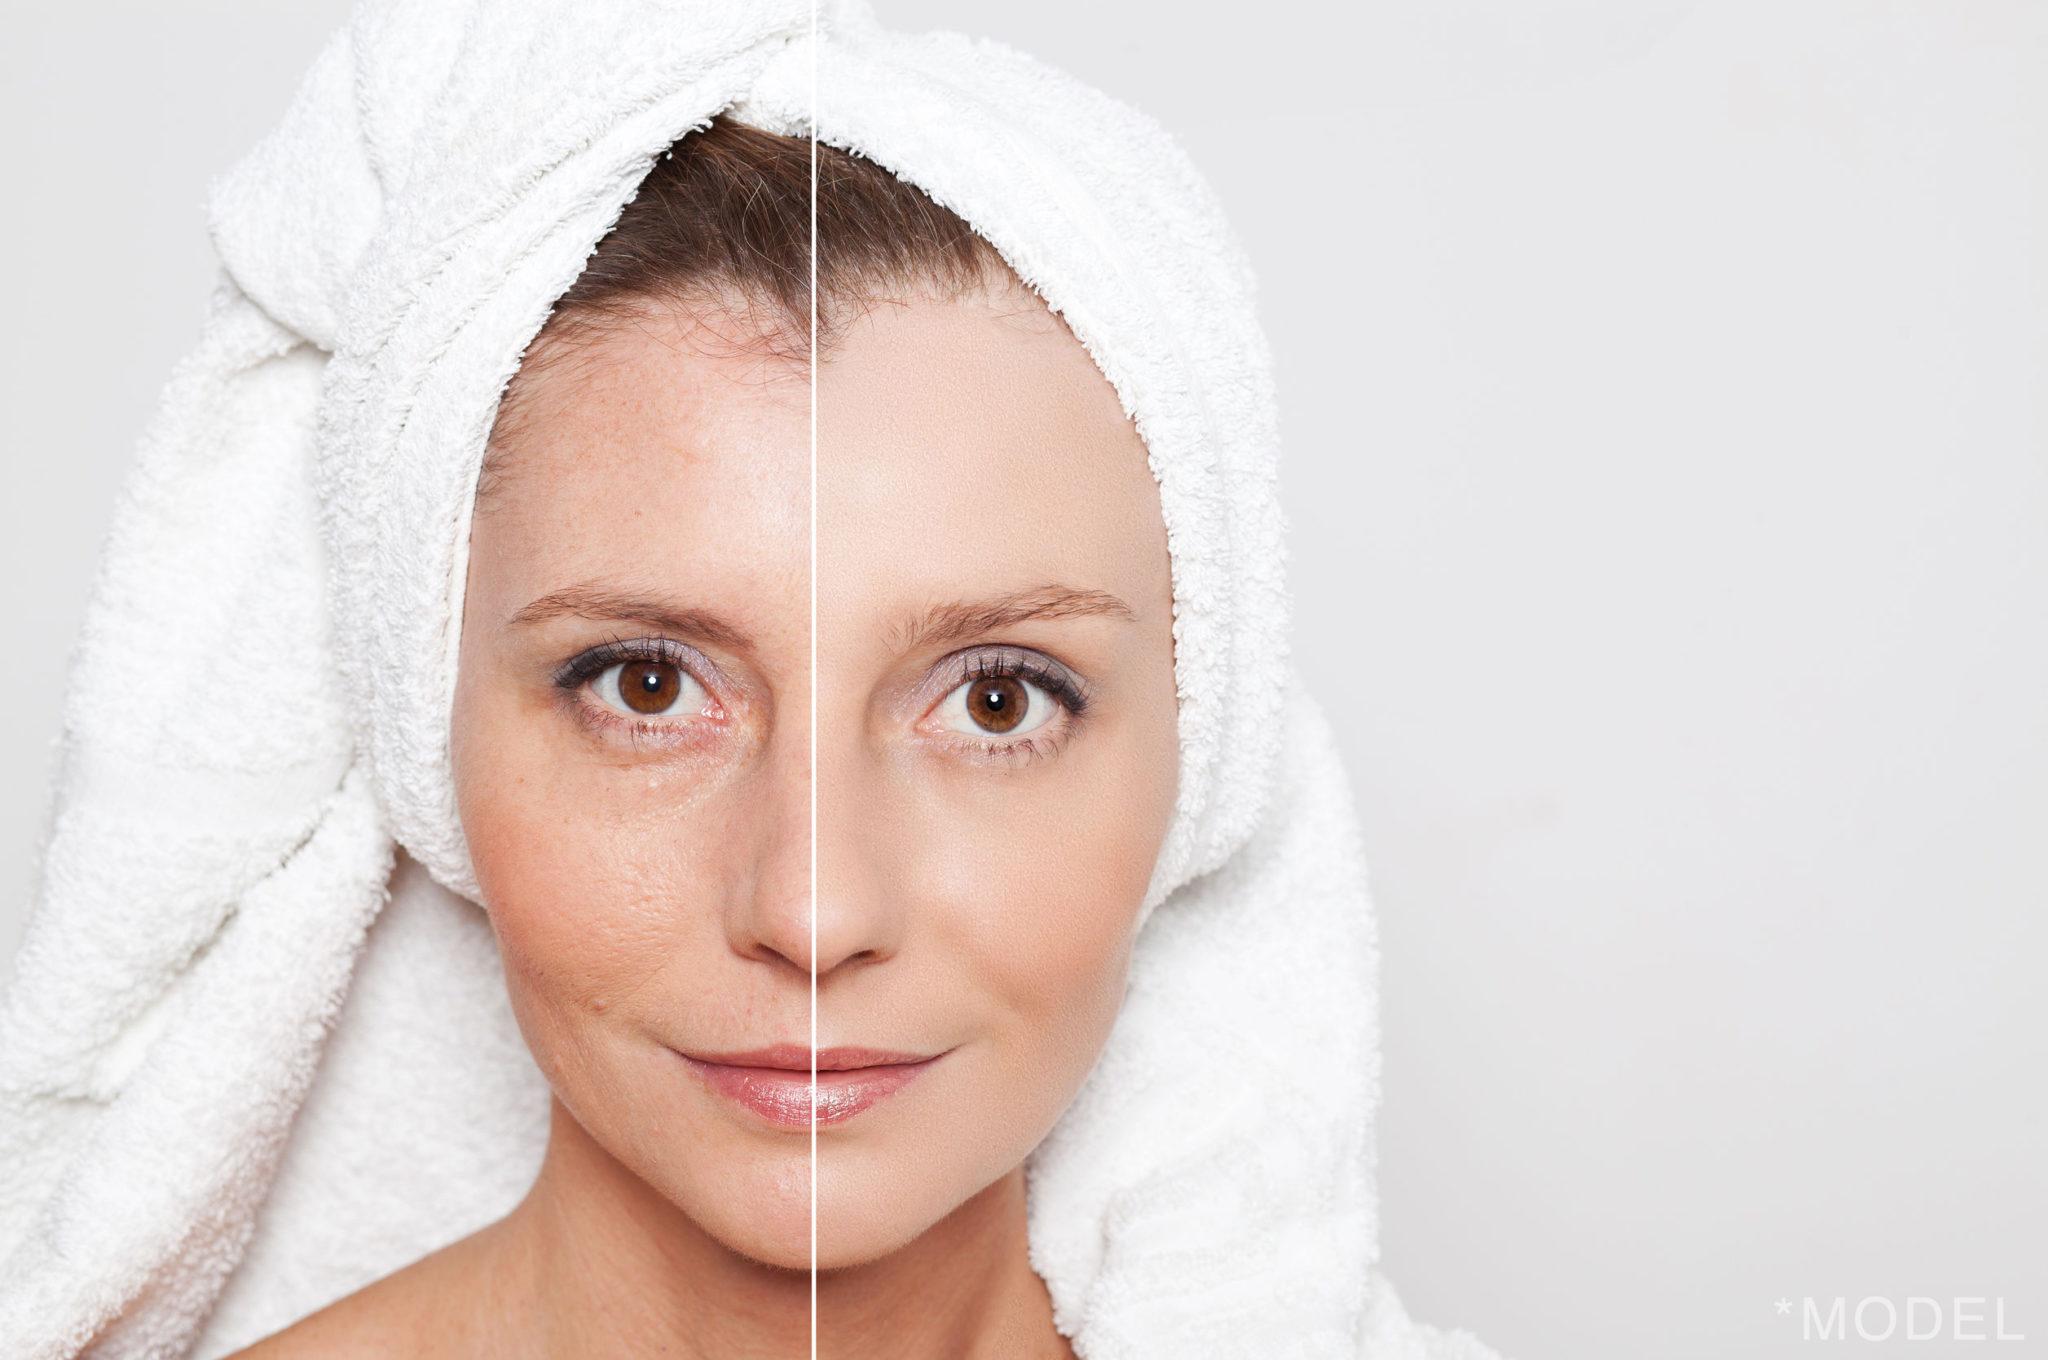 Skin Damage Restoration